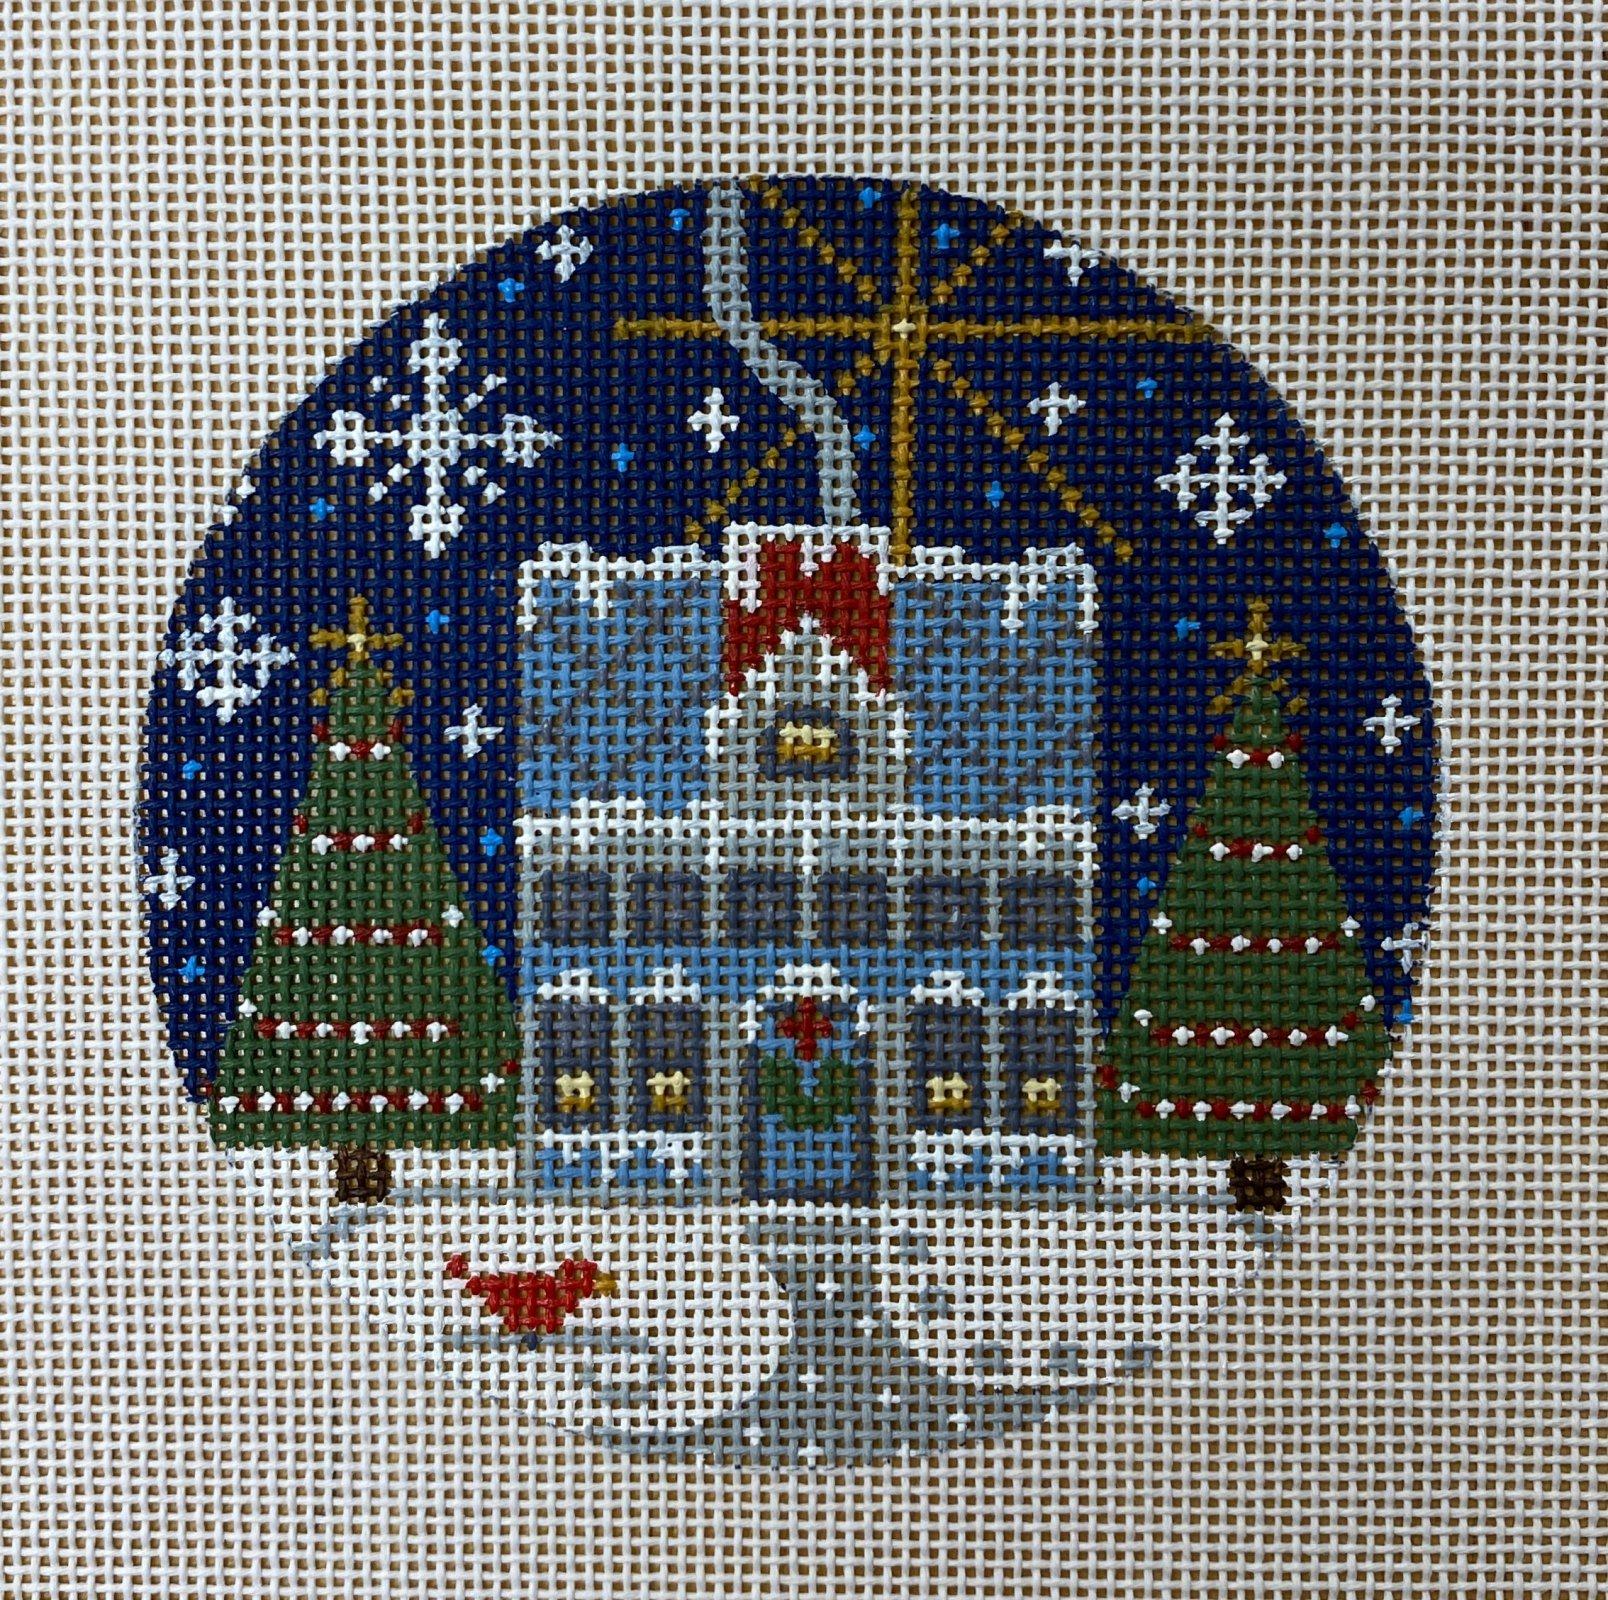 blue house ornament